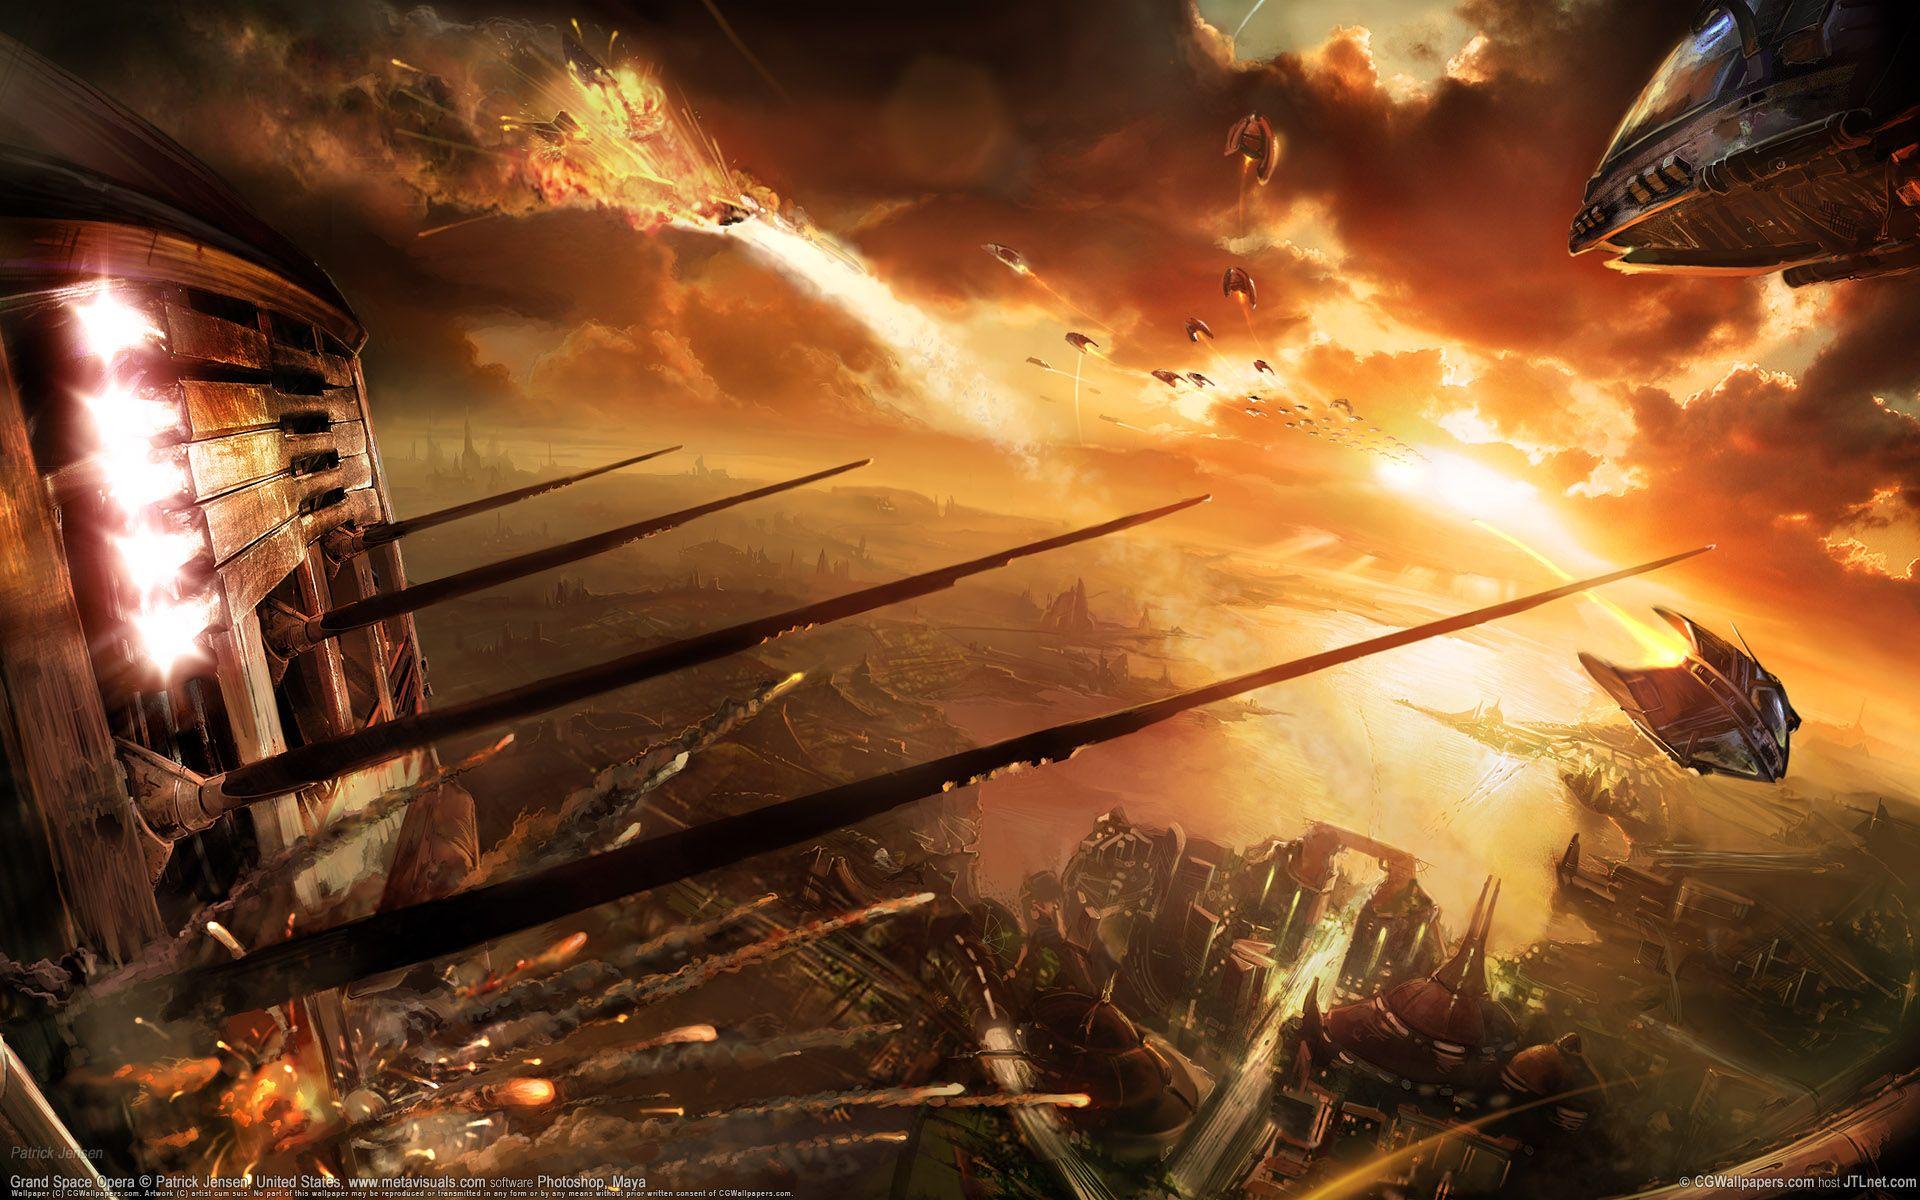 Epic Space War Wallpaper For Windows Tkg Science Fiction Artwork Scifi Fantasy Art Space Battles